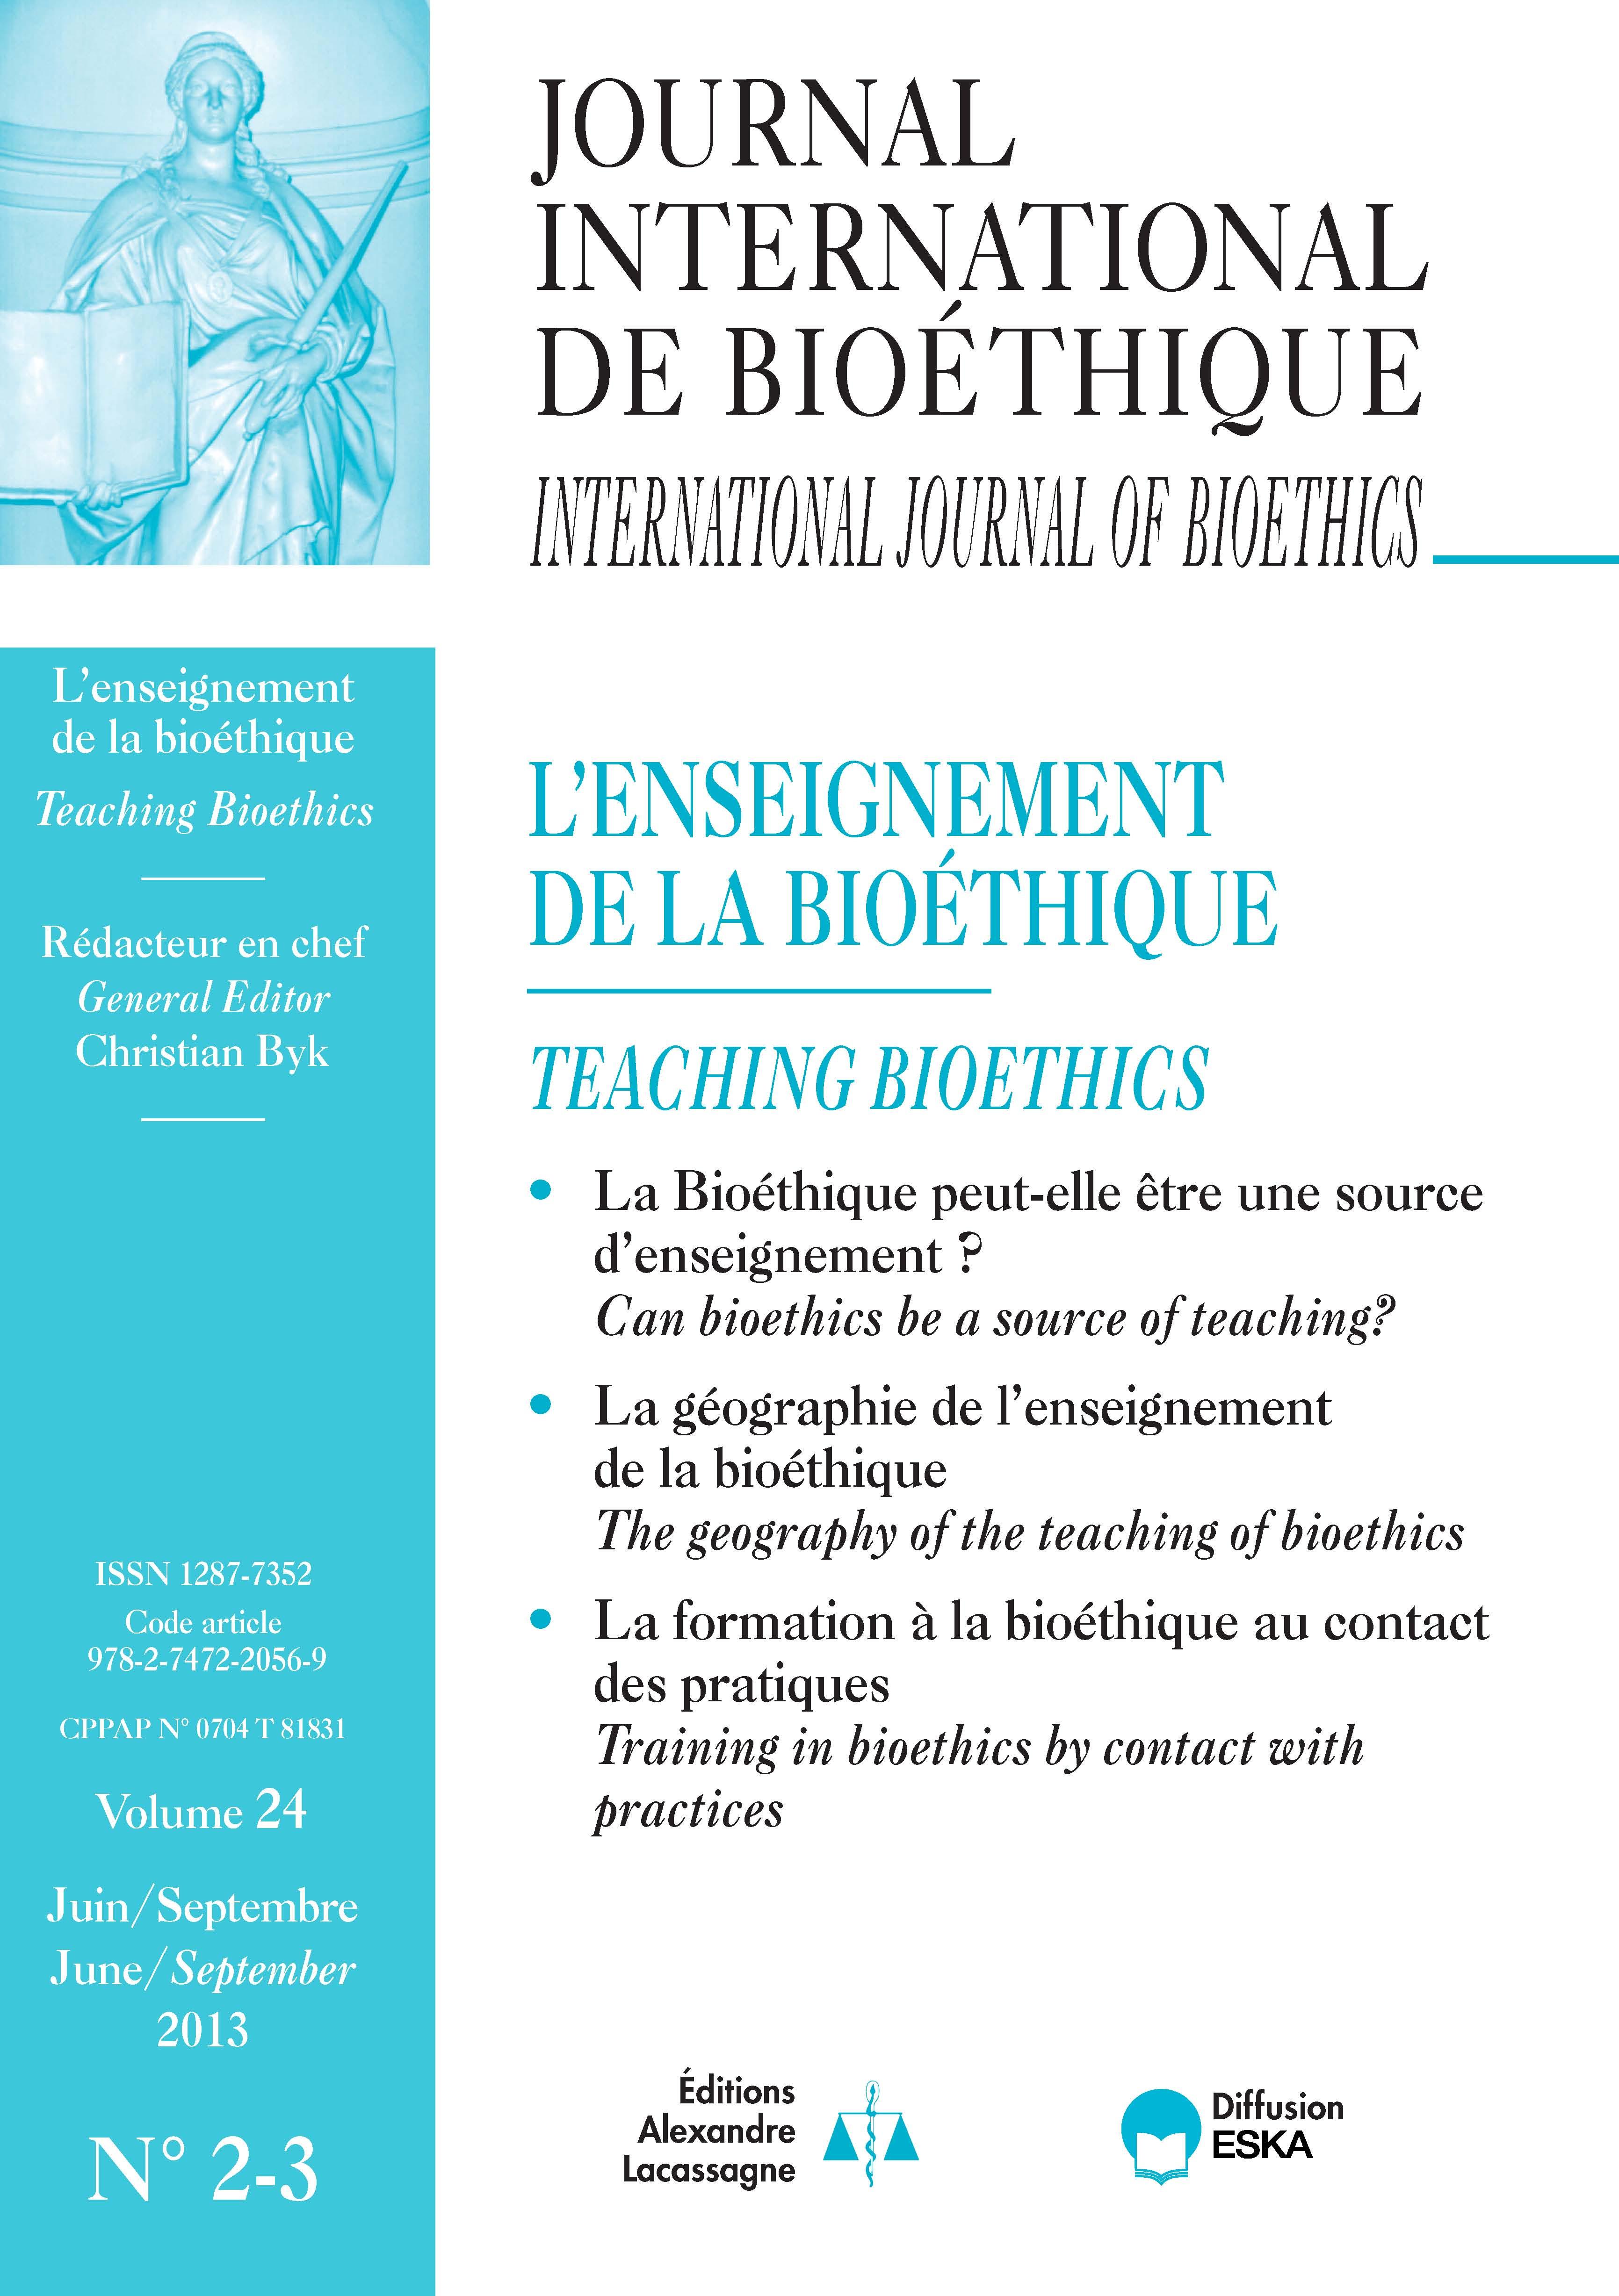 Bioethics Bibliography